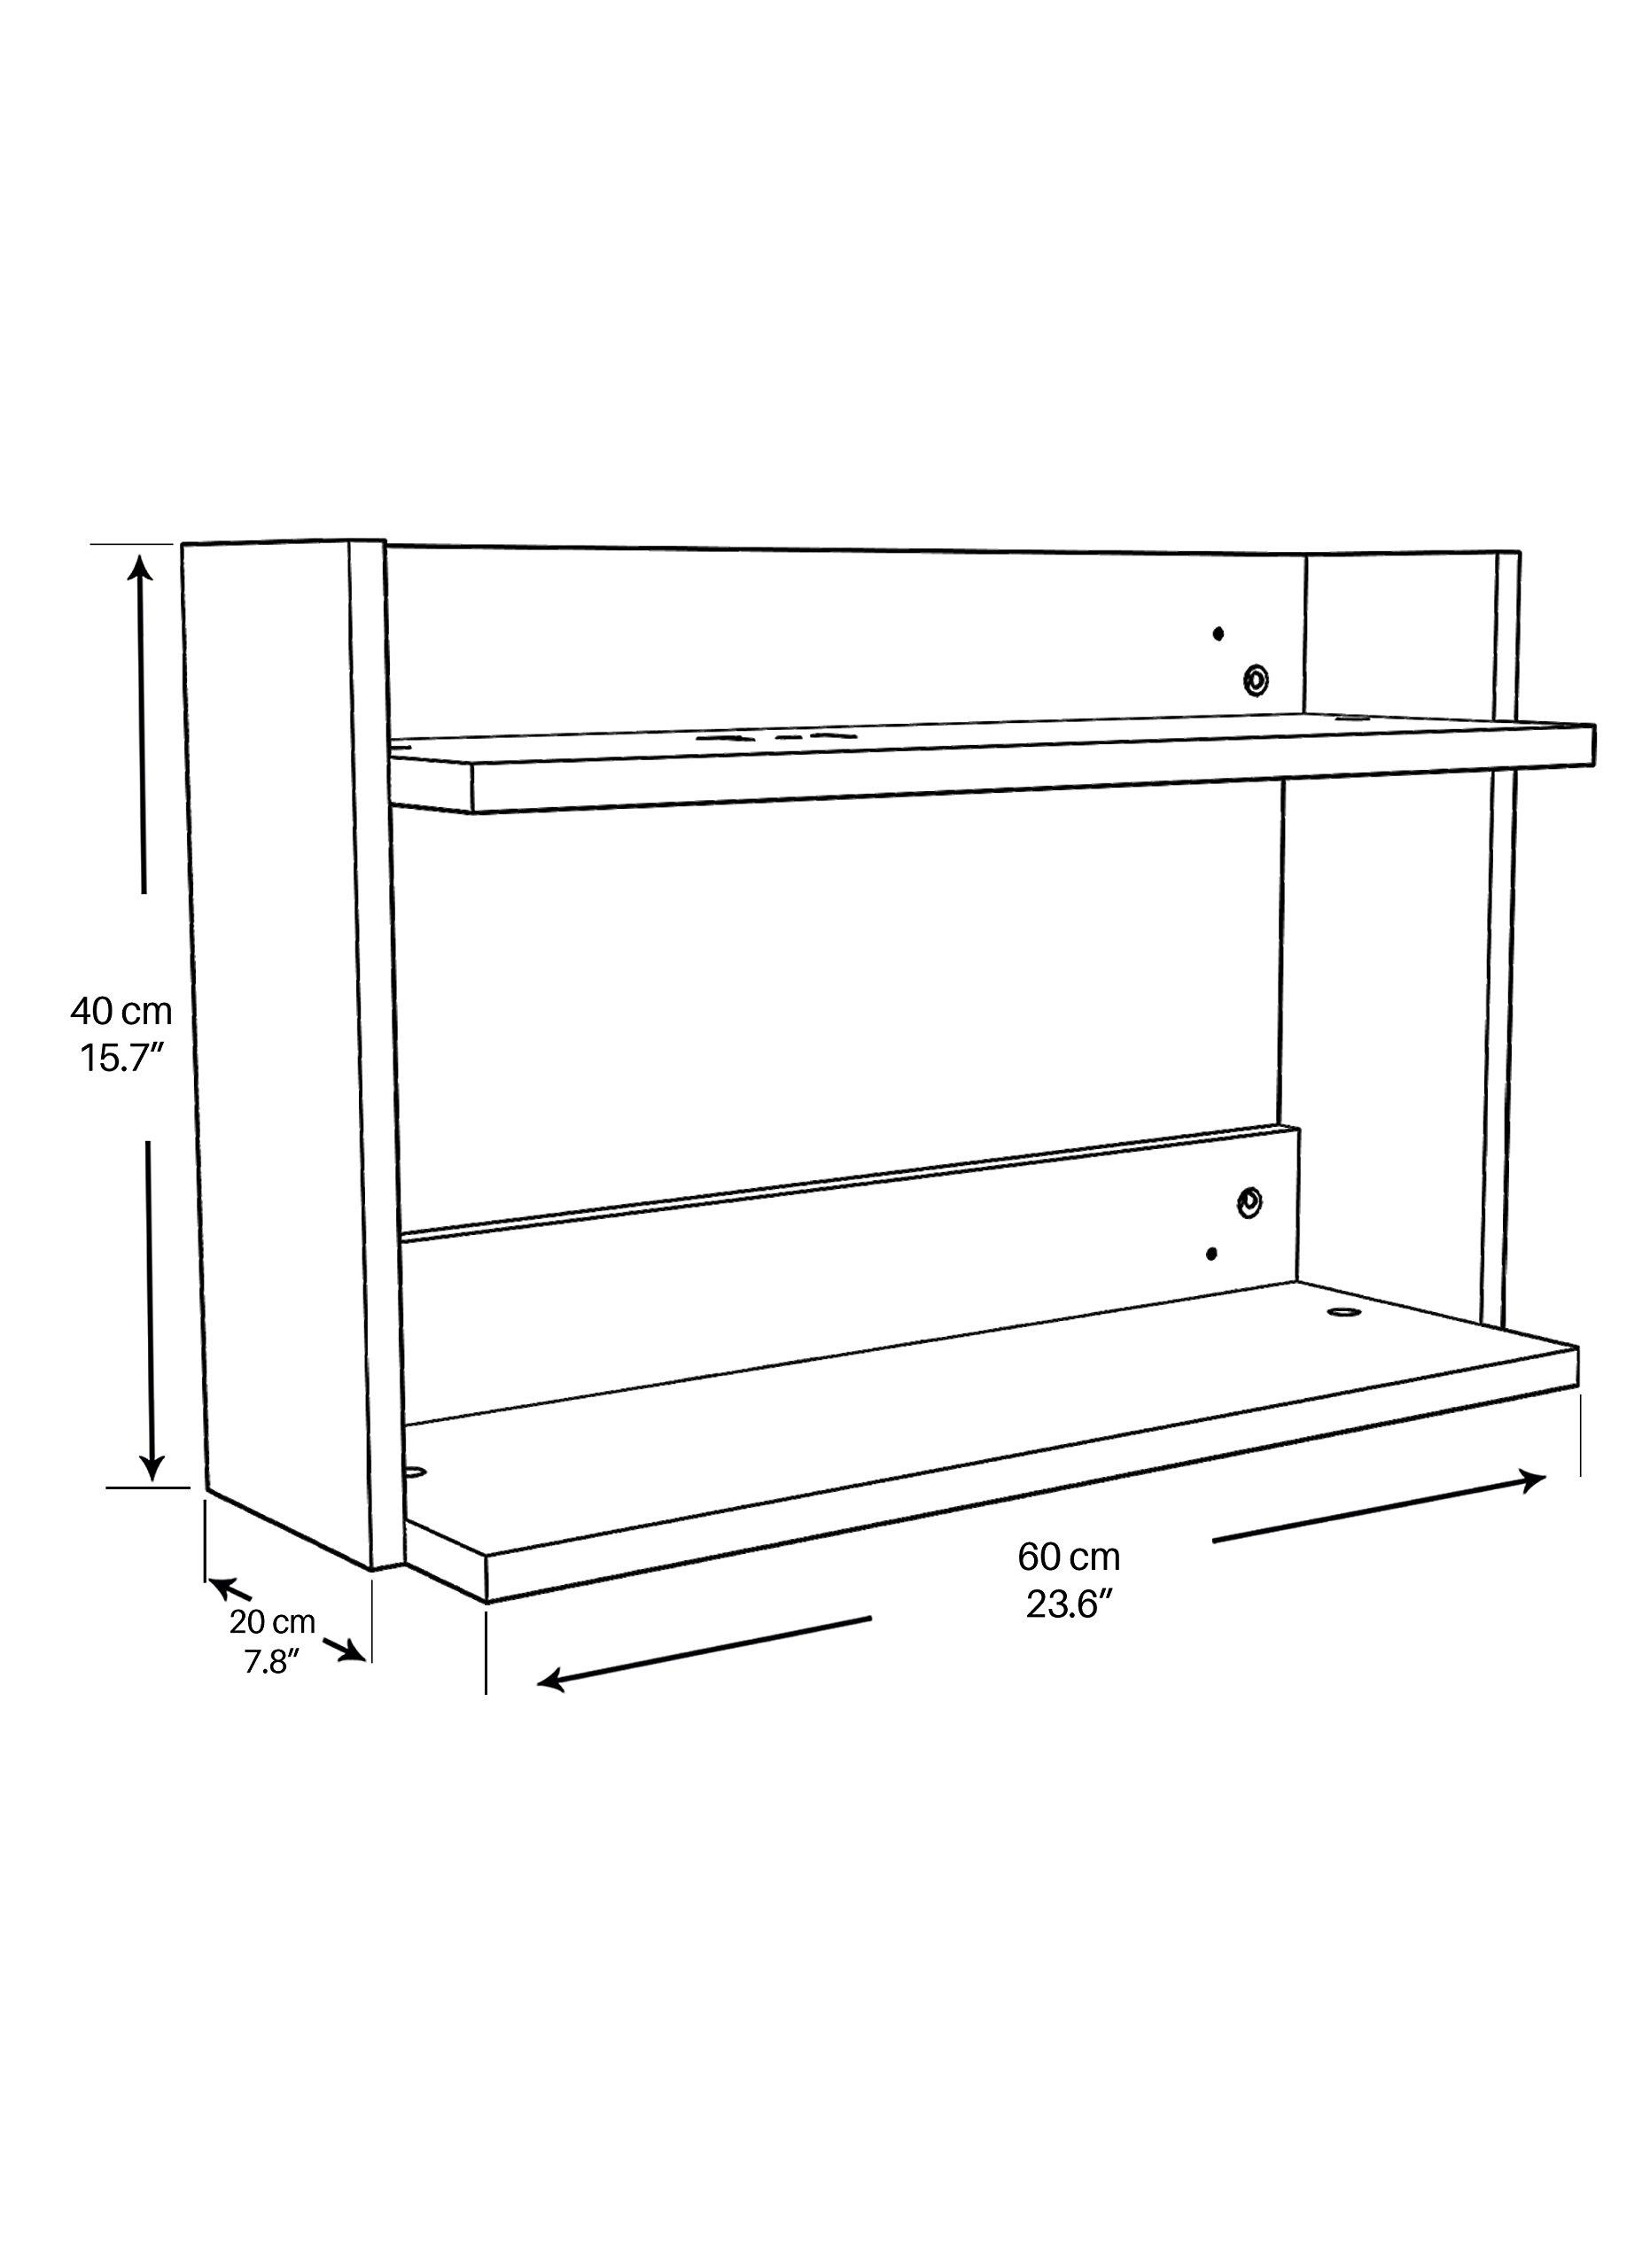 Aerial Shelf R-A6 - Floating Shelves/Floating Shelf by RTA Disegno (Image #2)